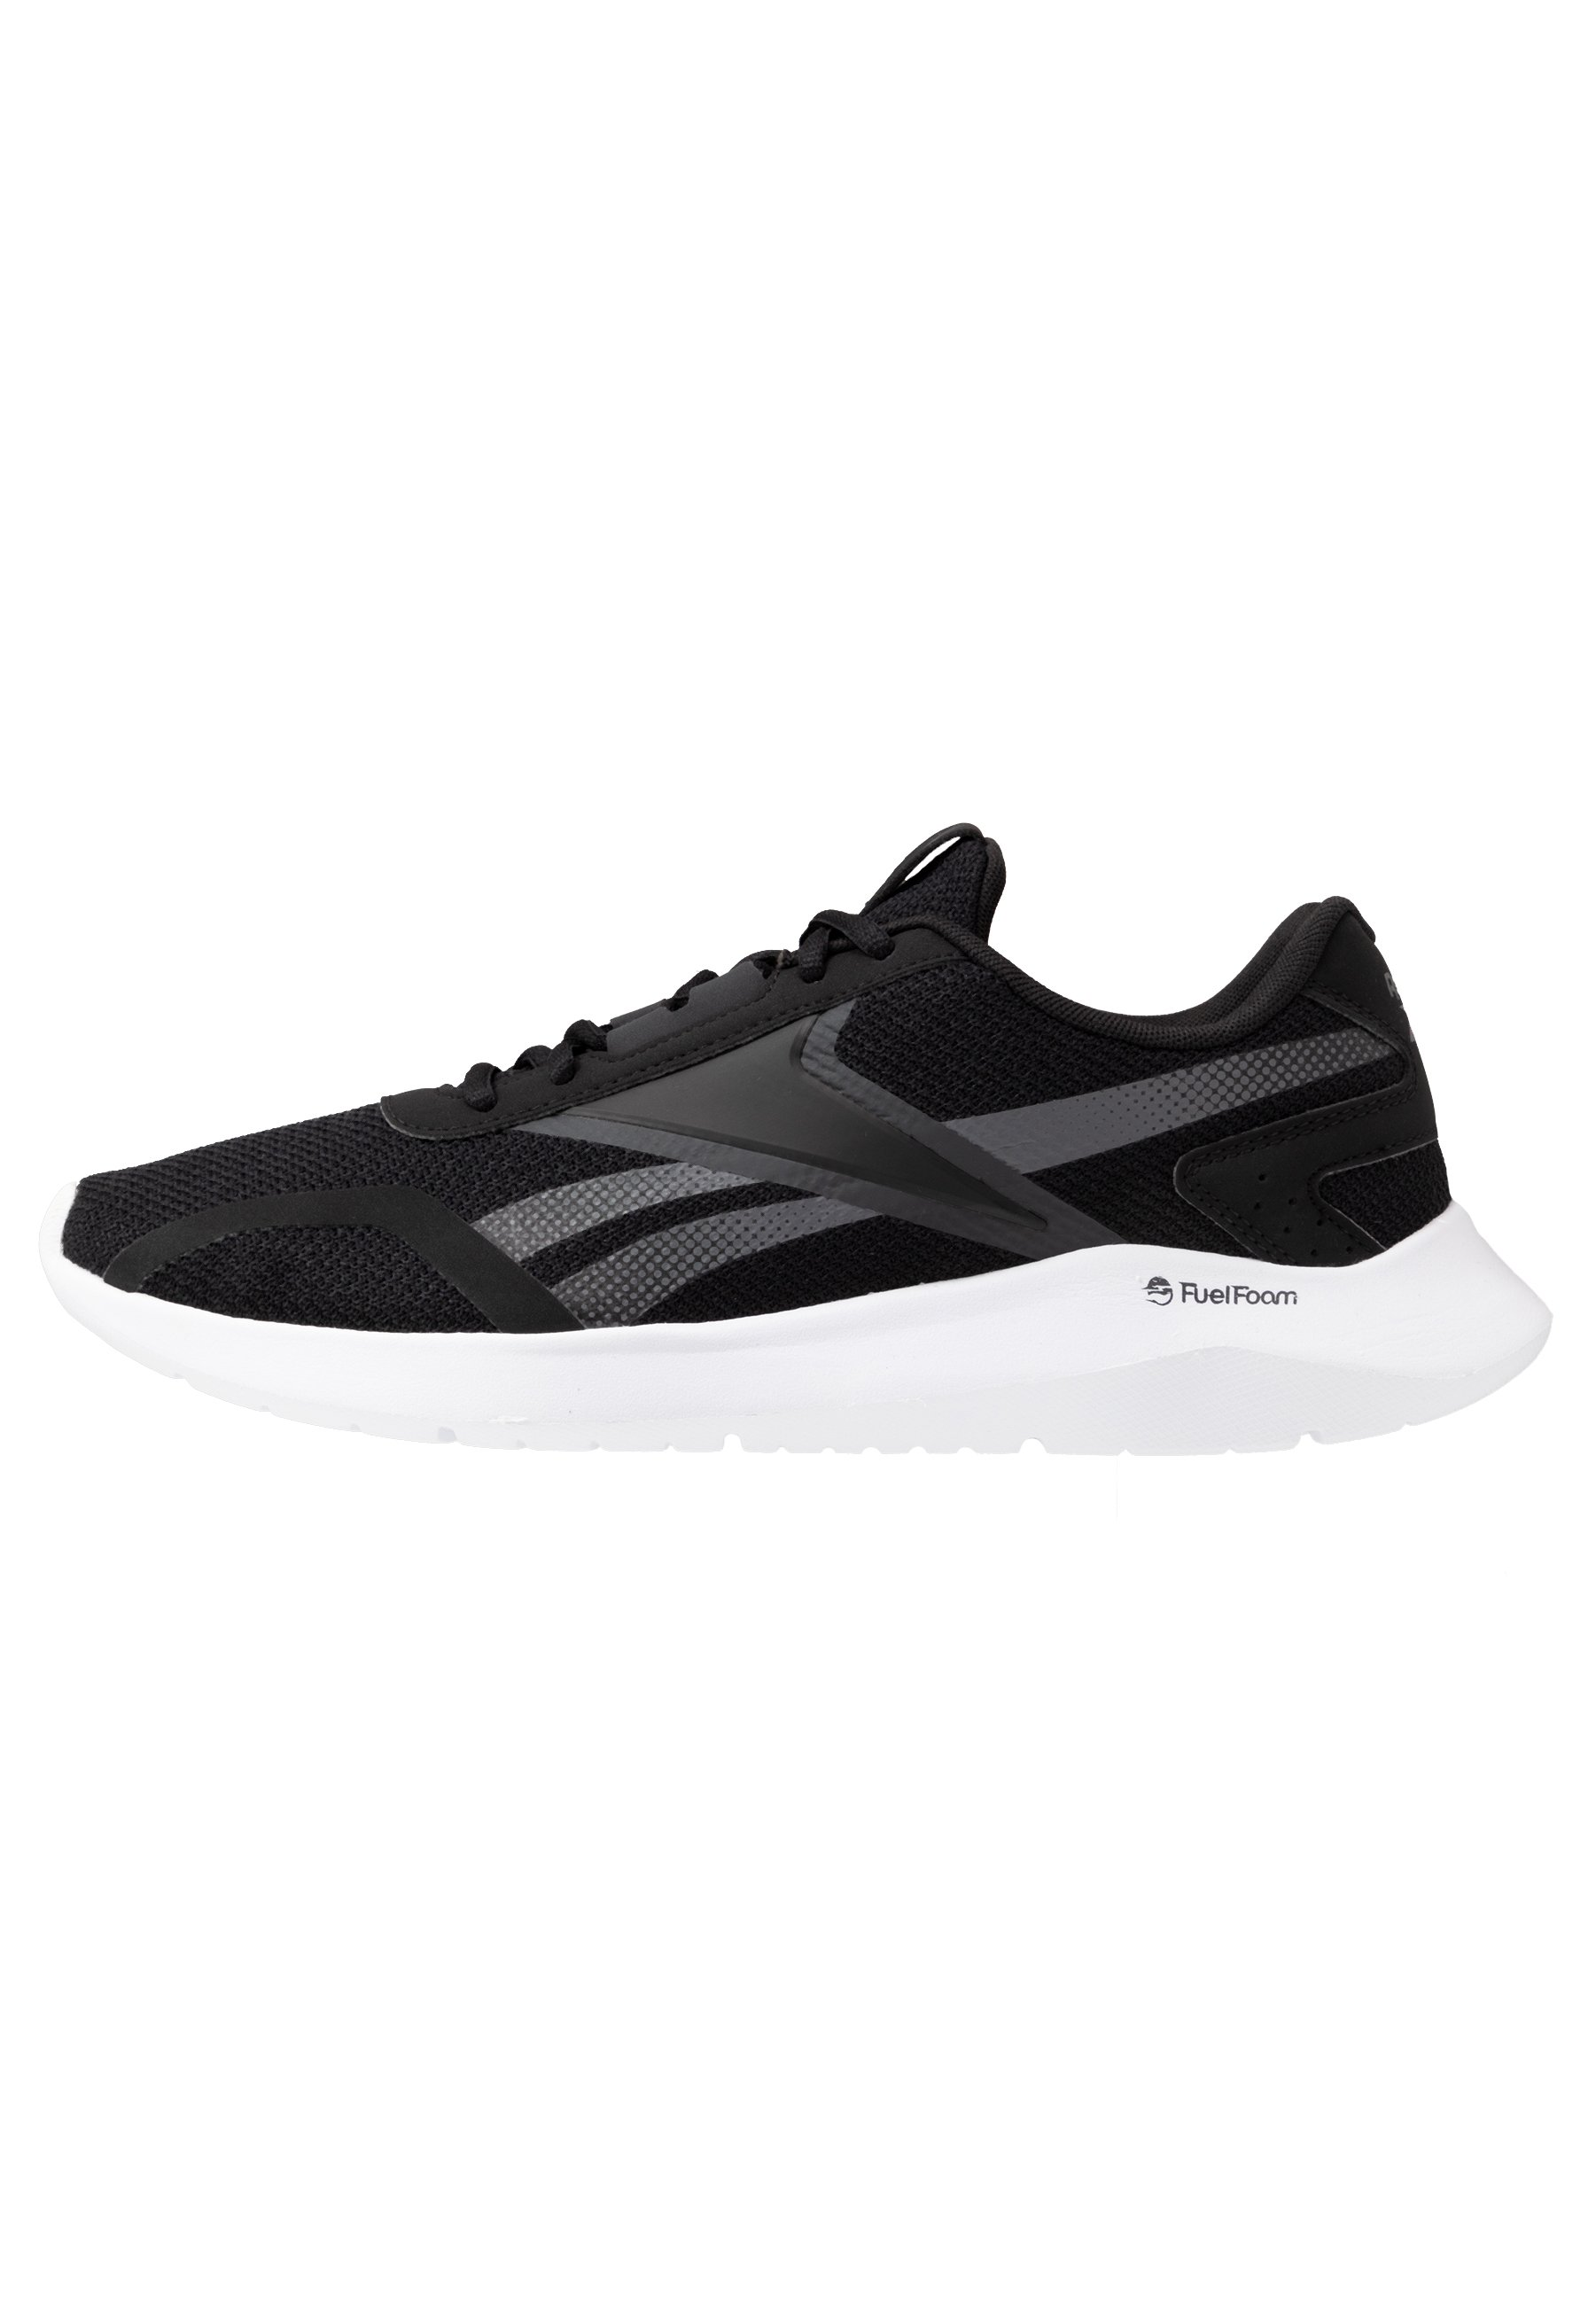 ENERGYLUX 2.0 Zapatillas de running neutras black